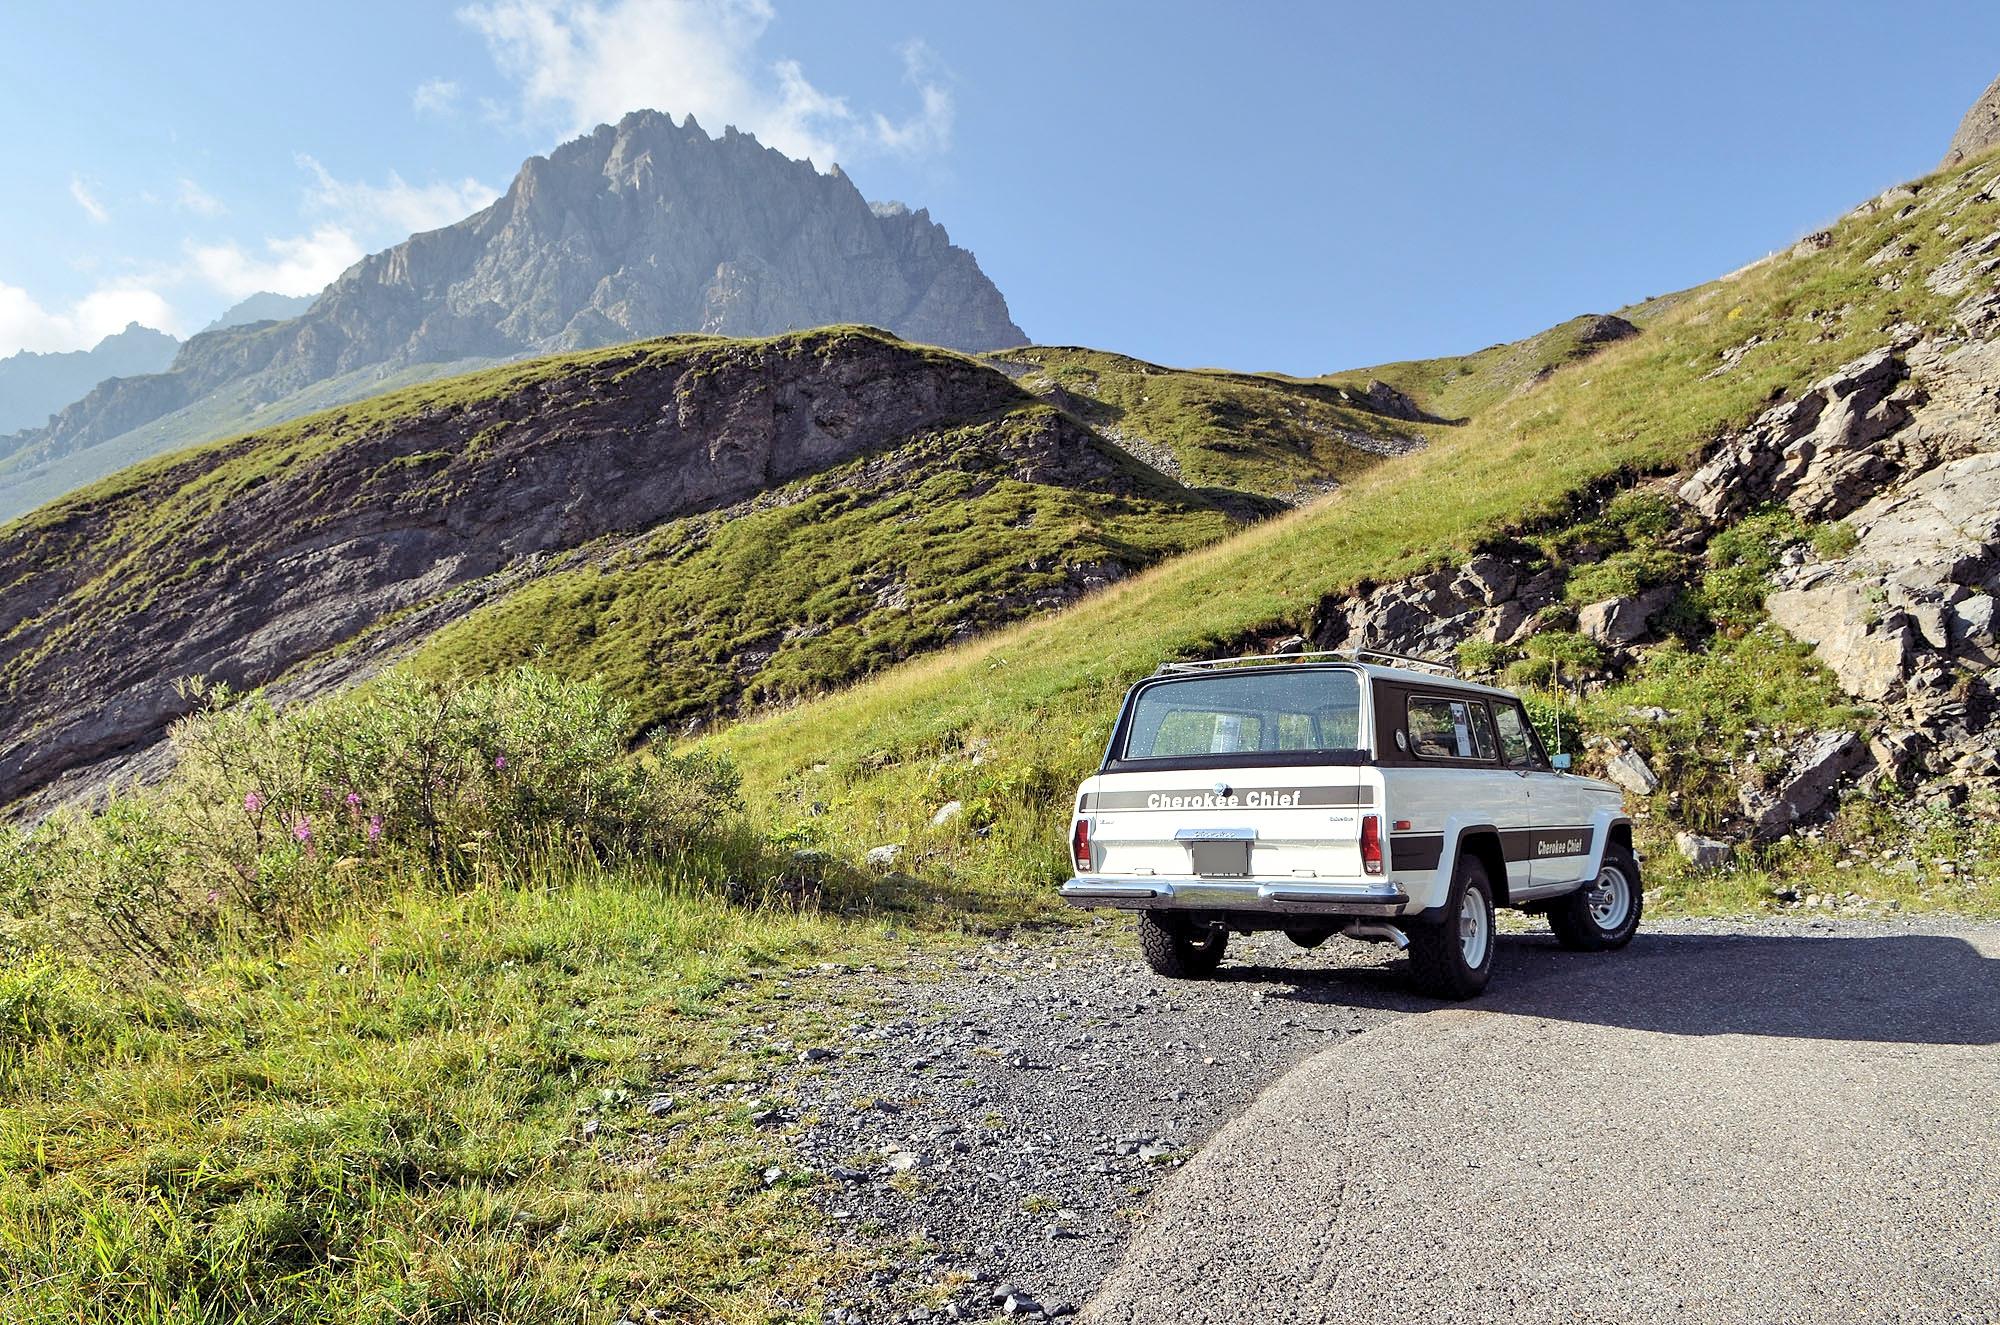 jeep-cherokee-chief-valloire-087.JPG